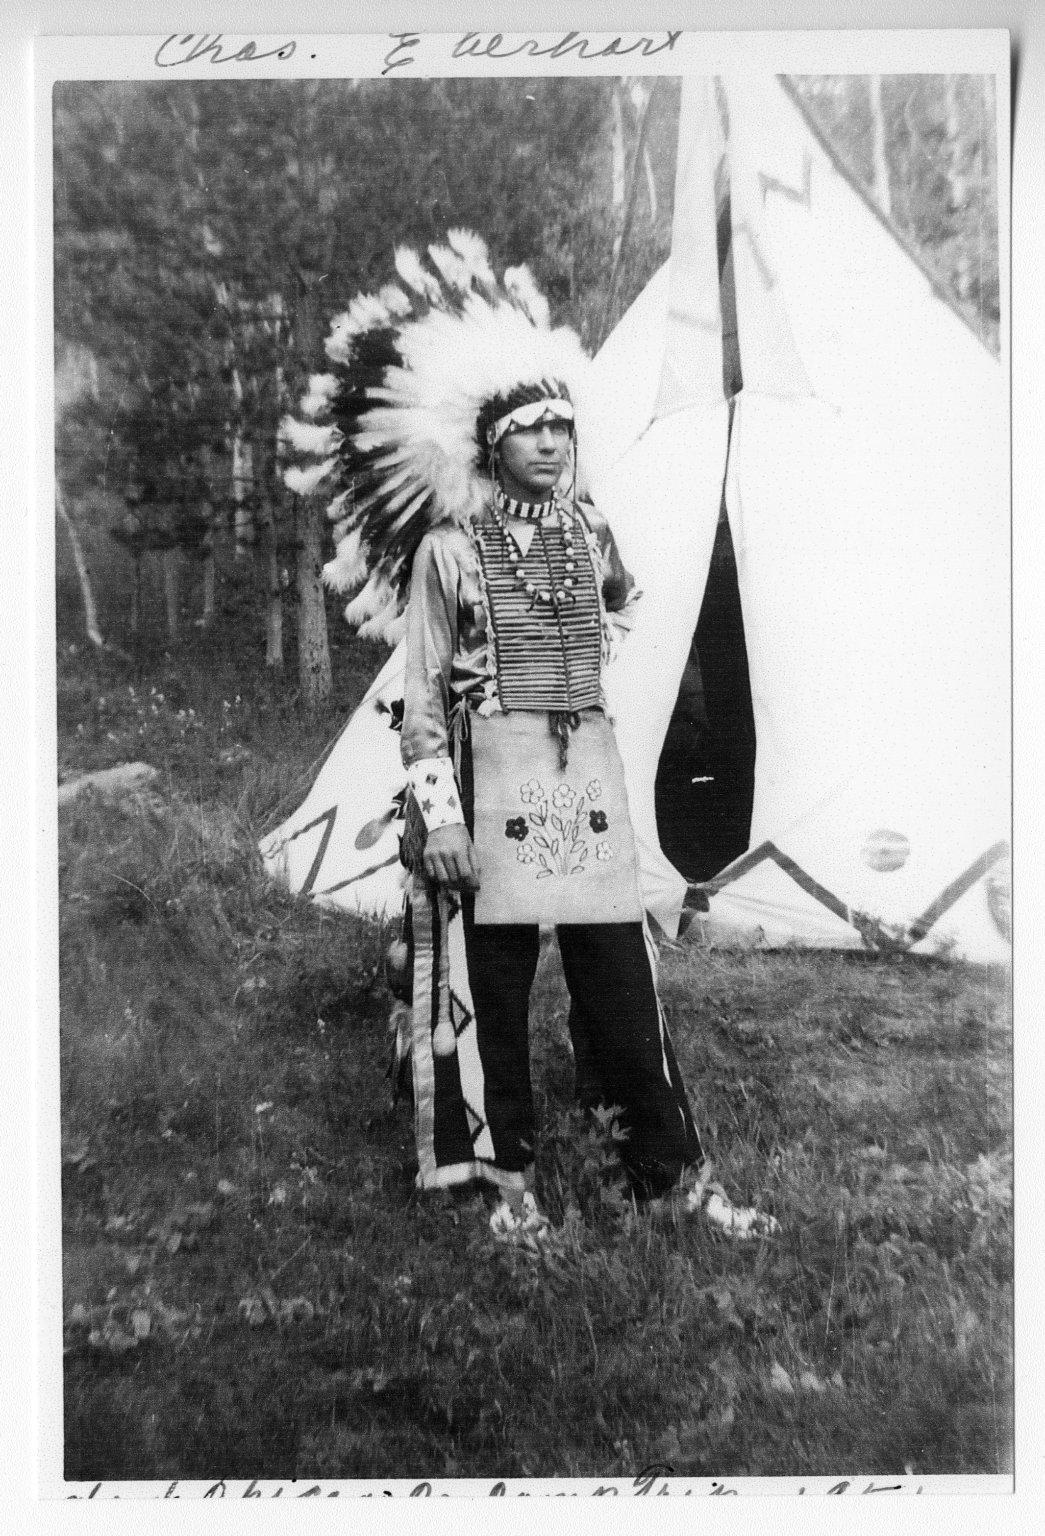 Charles Eberhart on Camping Trip